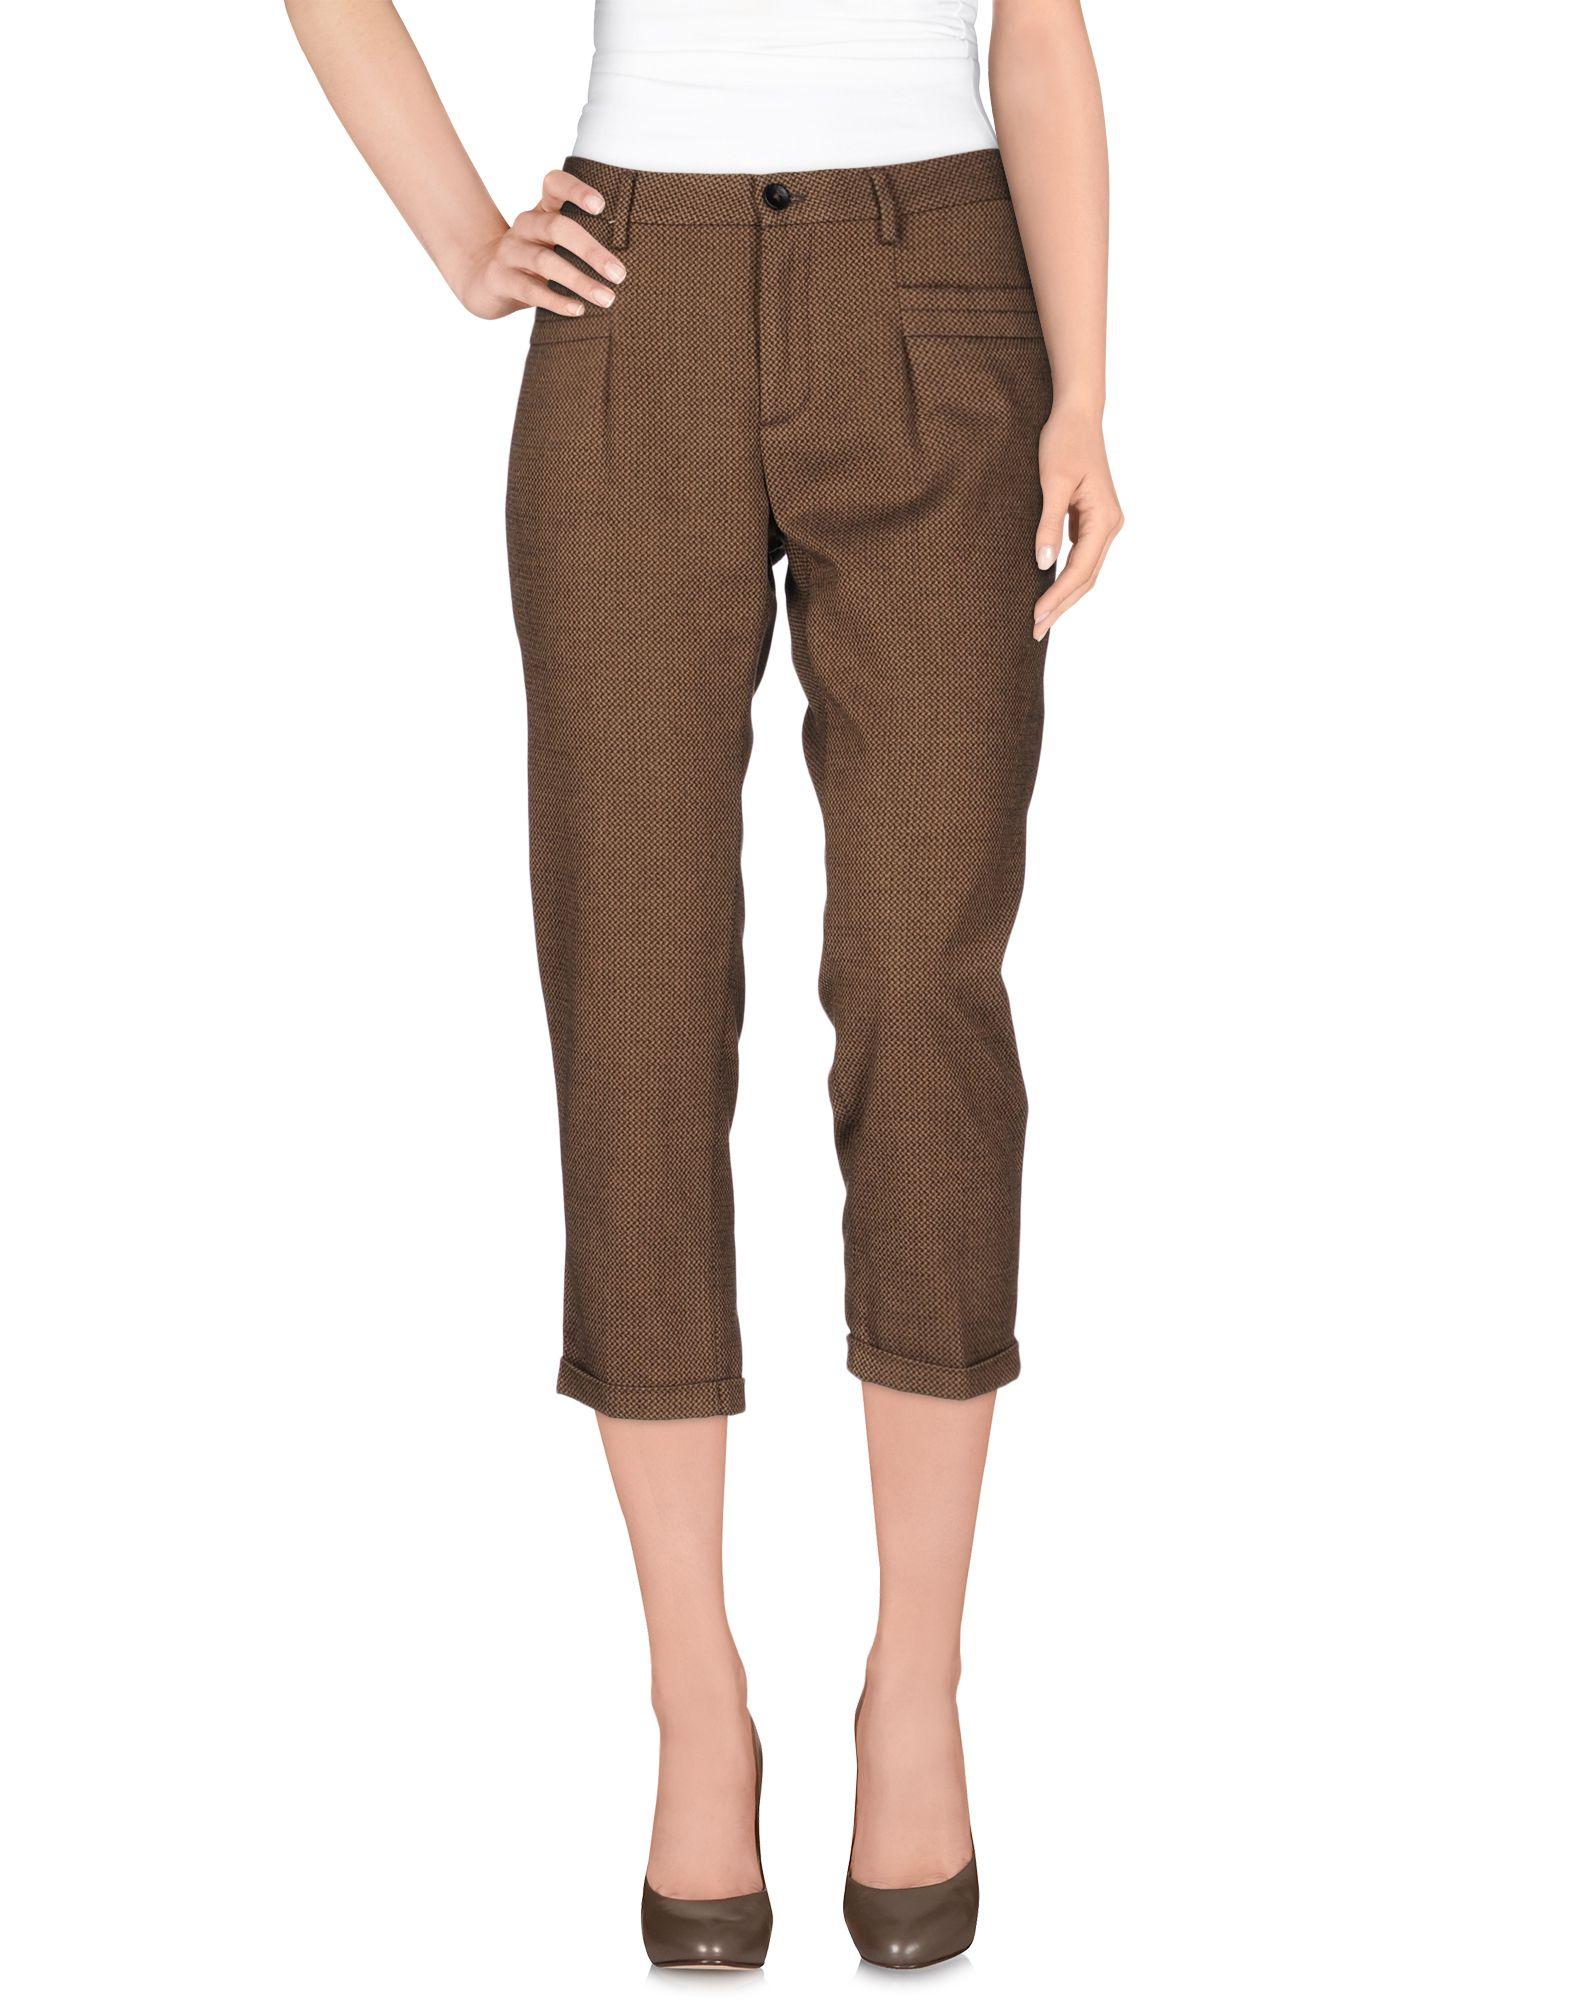 Simple Alysi Casual Trouser In Brown Khaki  Lyst